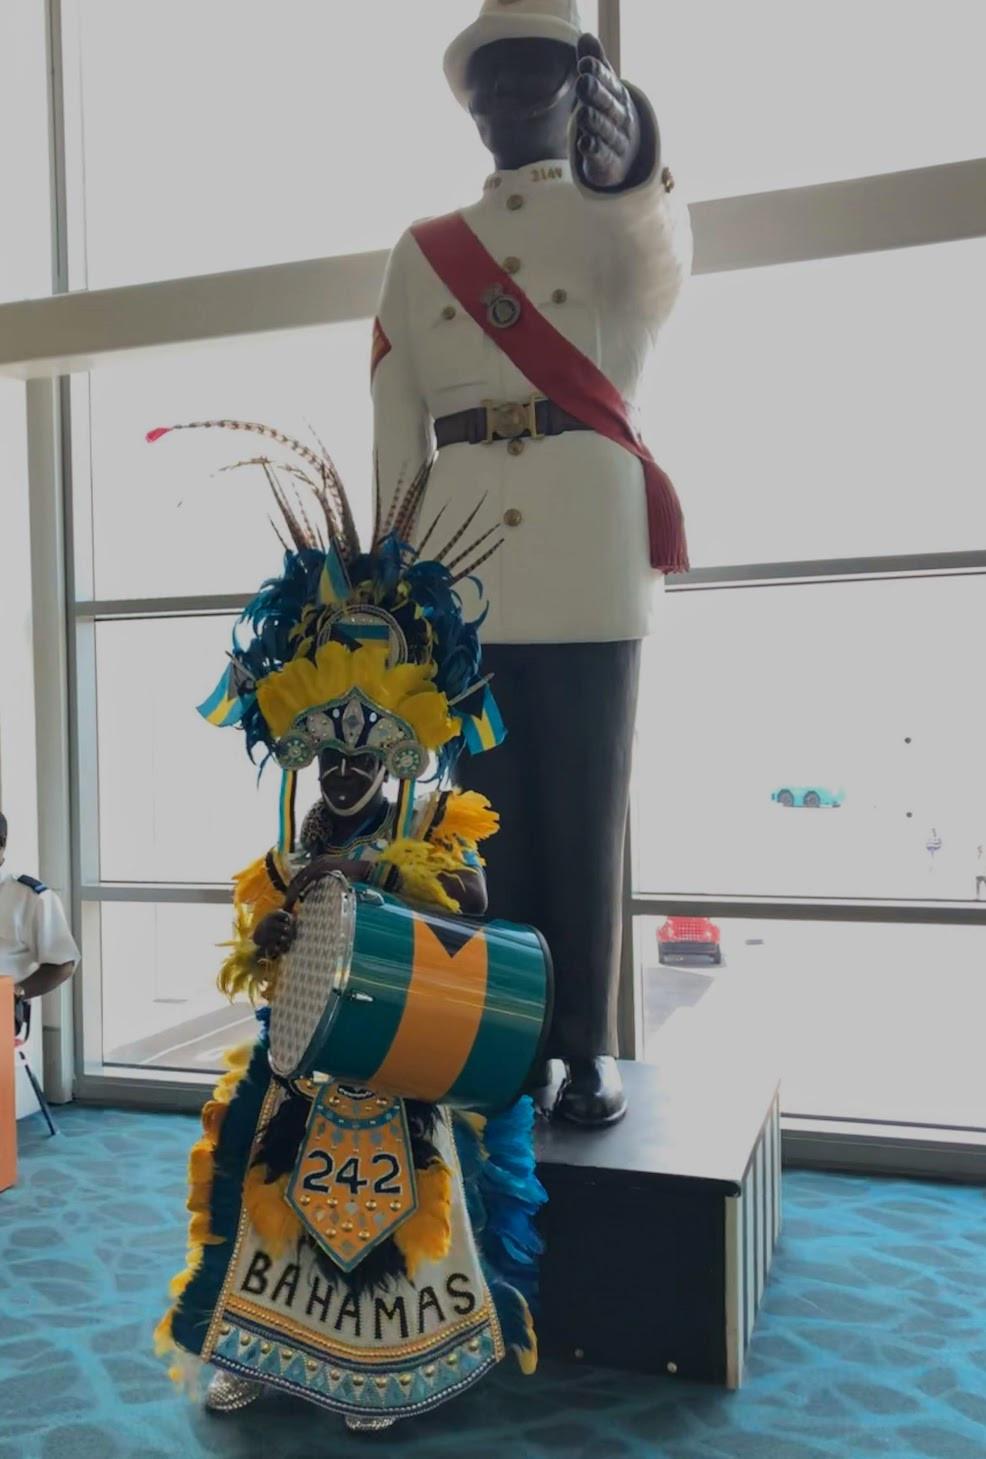 Junkanoo performer in front of statue of Bahamas police